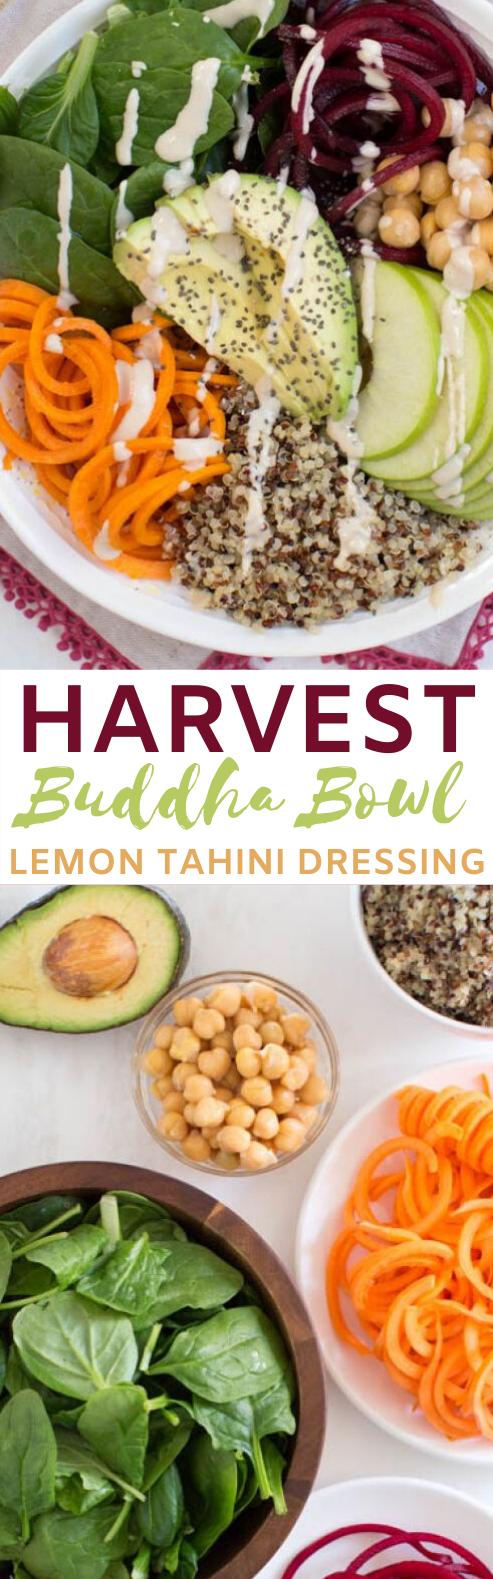 Harvest Buddha Bowl with Lemon Tahini Dressing #vegan #dinner #plantbased #glutenfree #healthy